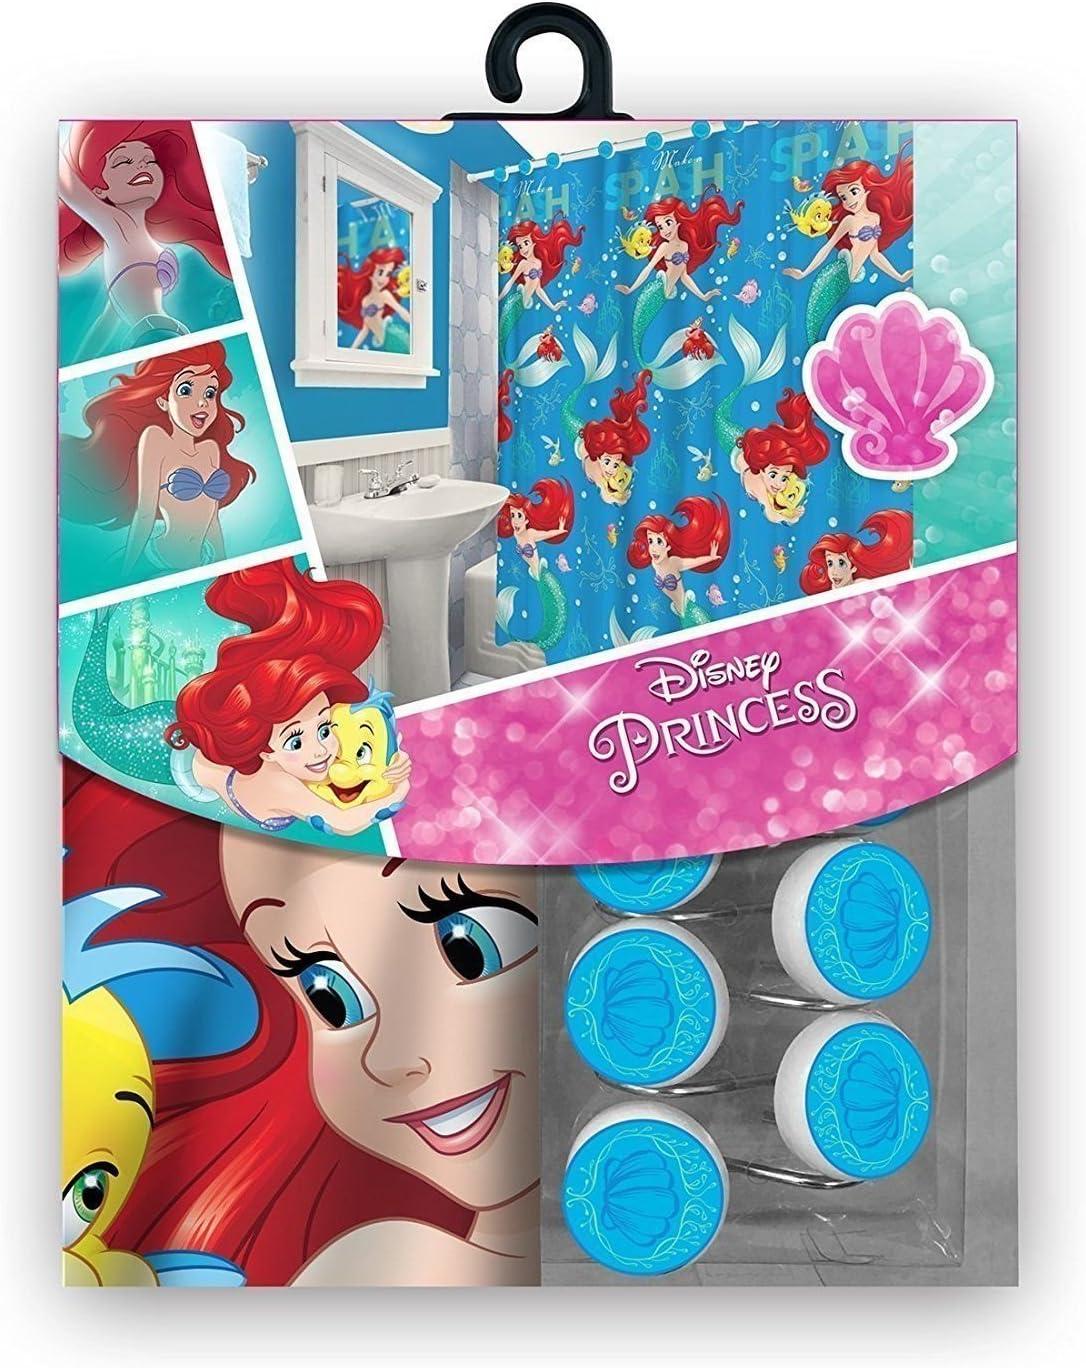 S.L. Home Fashions 13pc Disney Ariel Little Mermaid Shower Curtain and Hooks Set